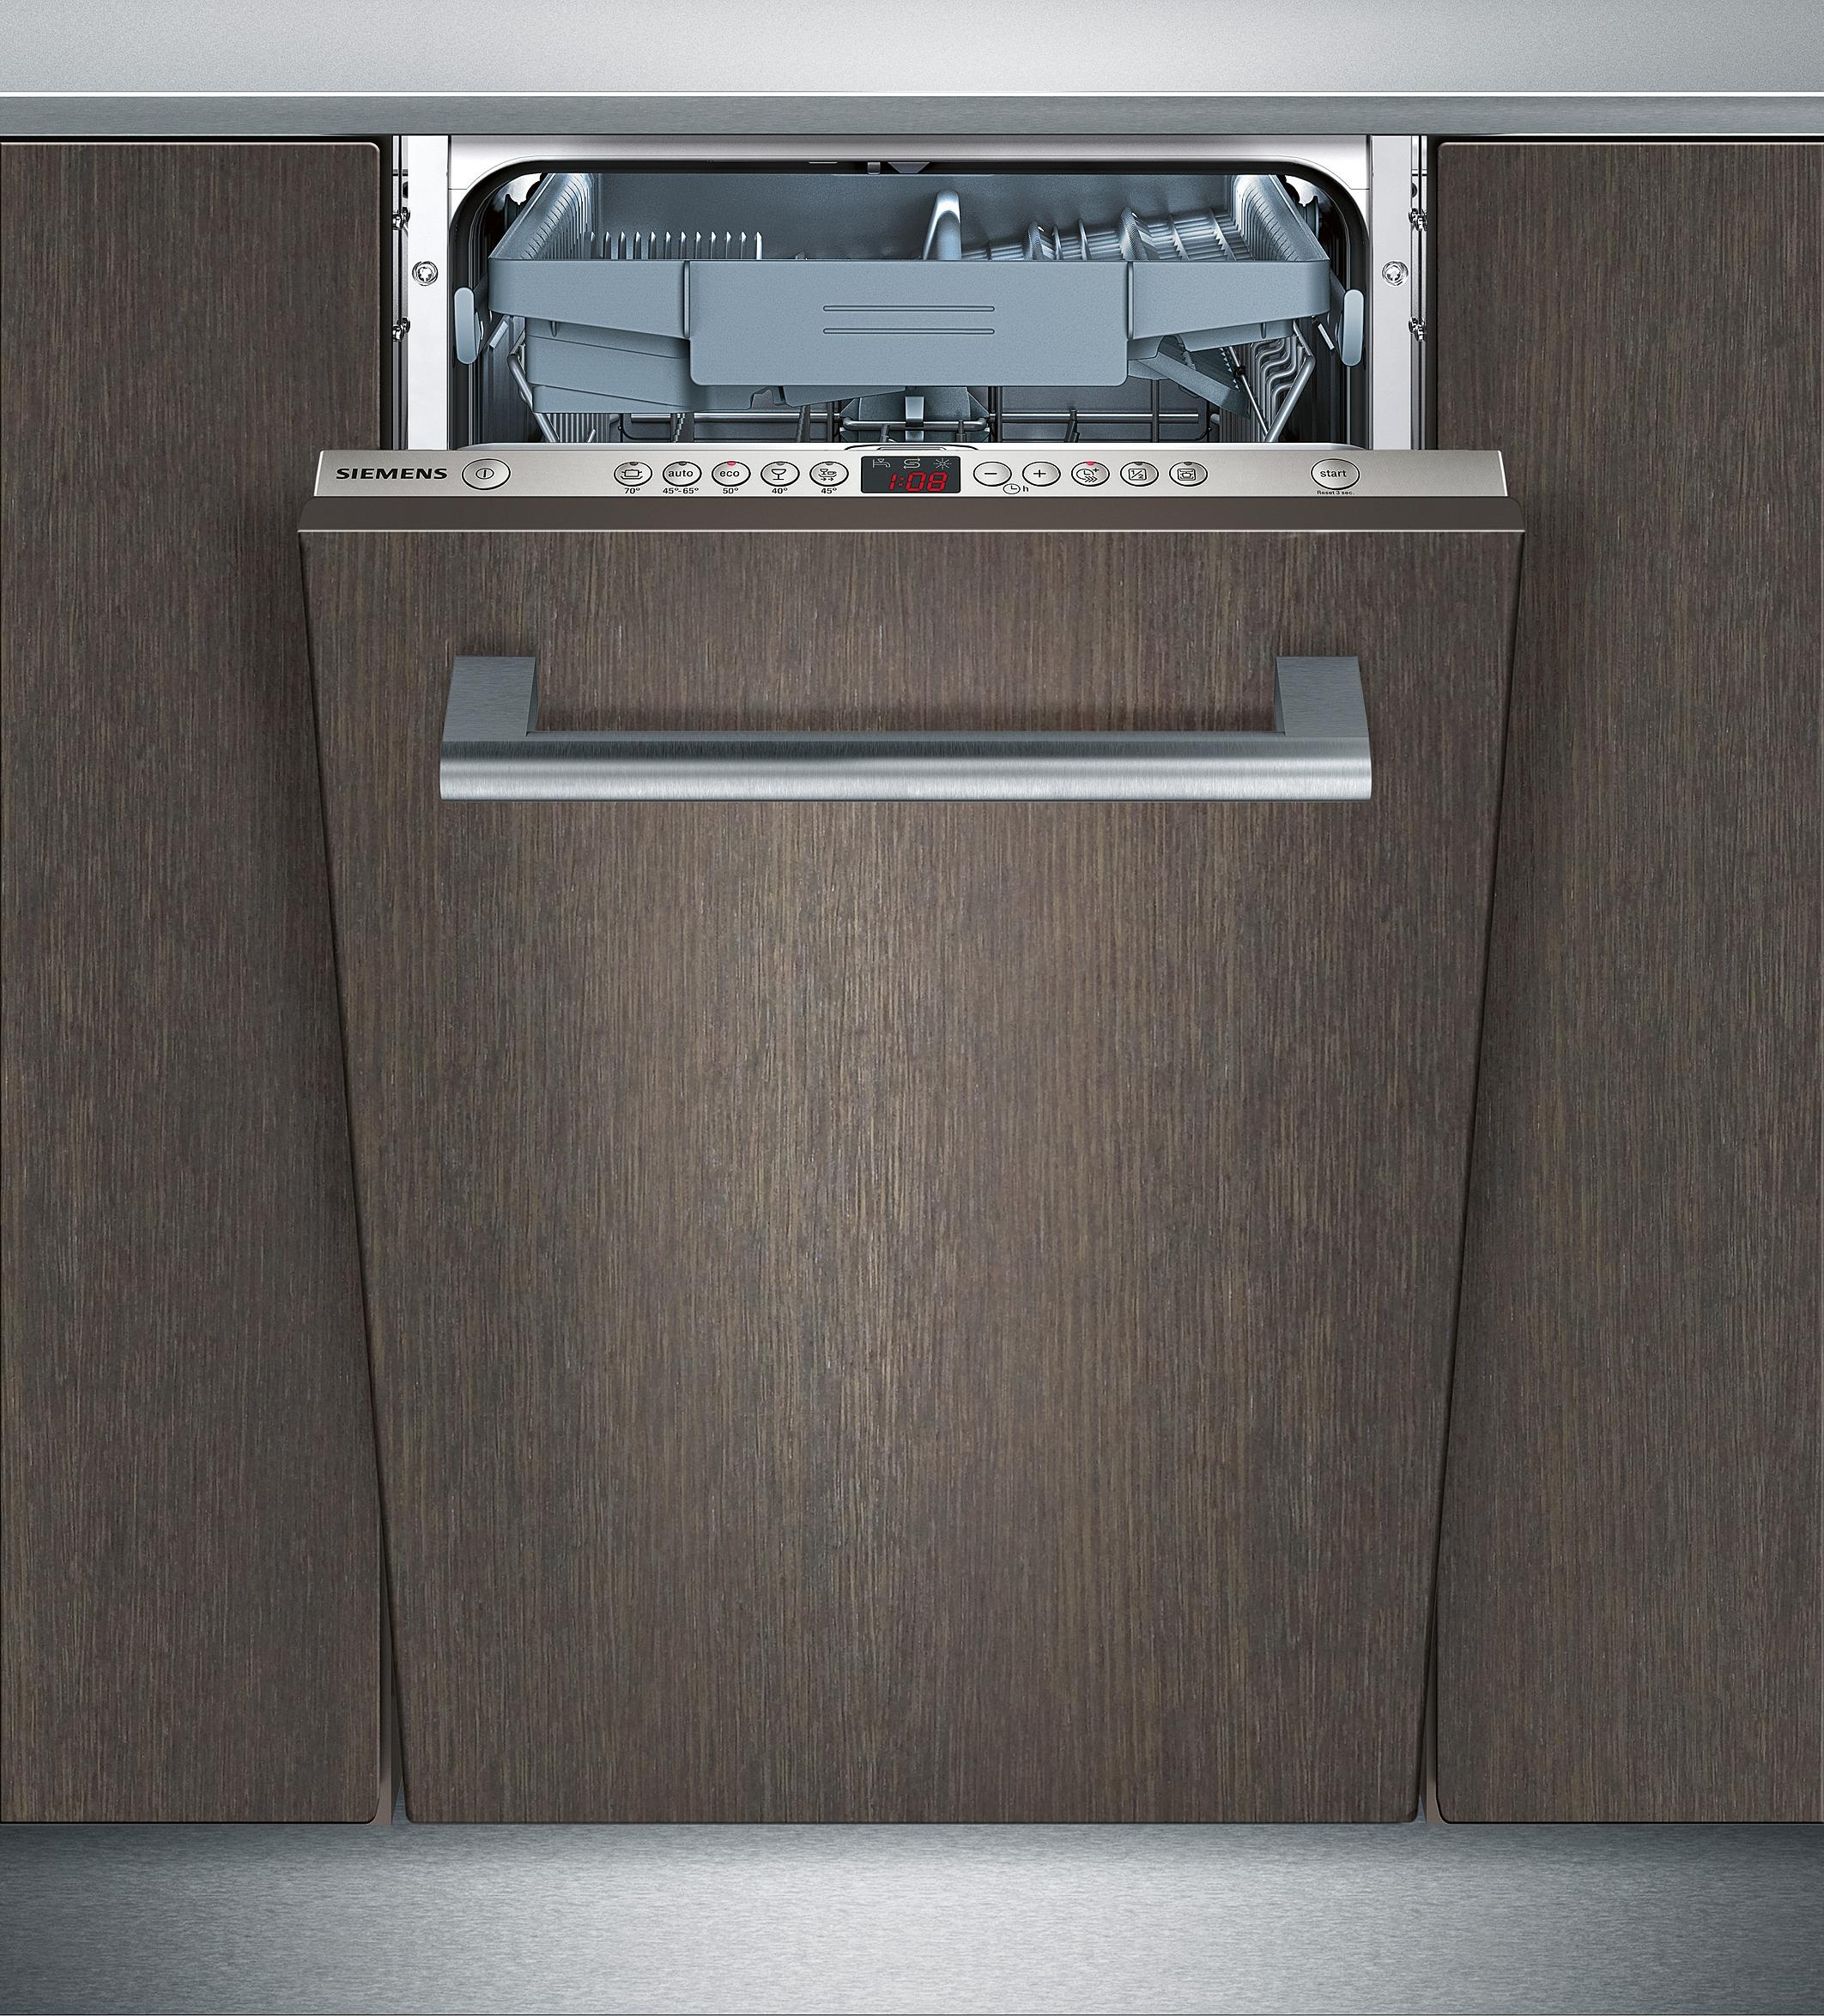 geschirrsp ler sr65m086eu speedmatic45 geschirrsp ler 45 cm vollintegrierbar. Black Bedroom Furniture Sets. Home Design Ideas